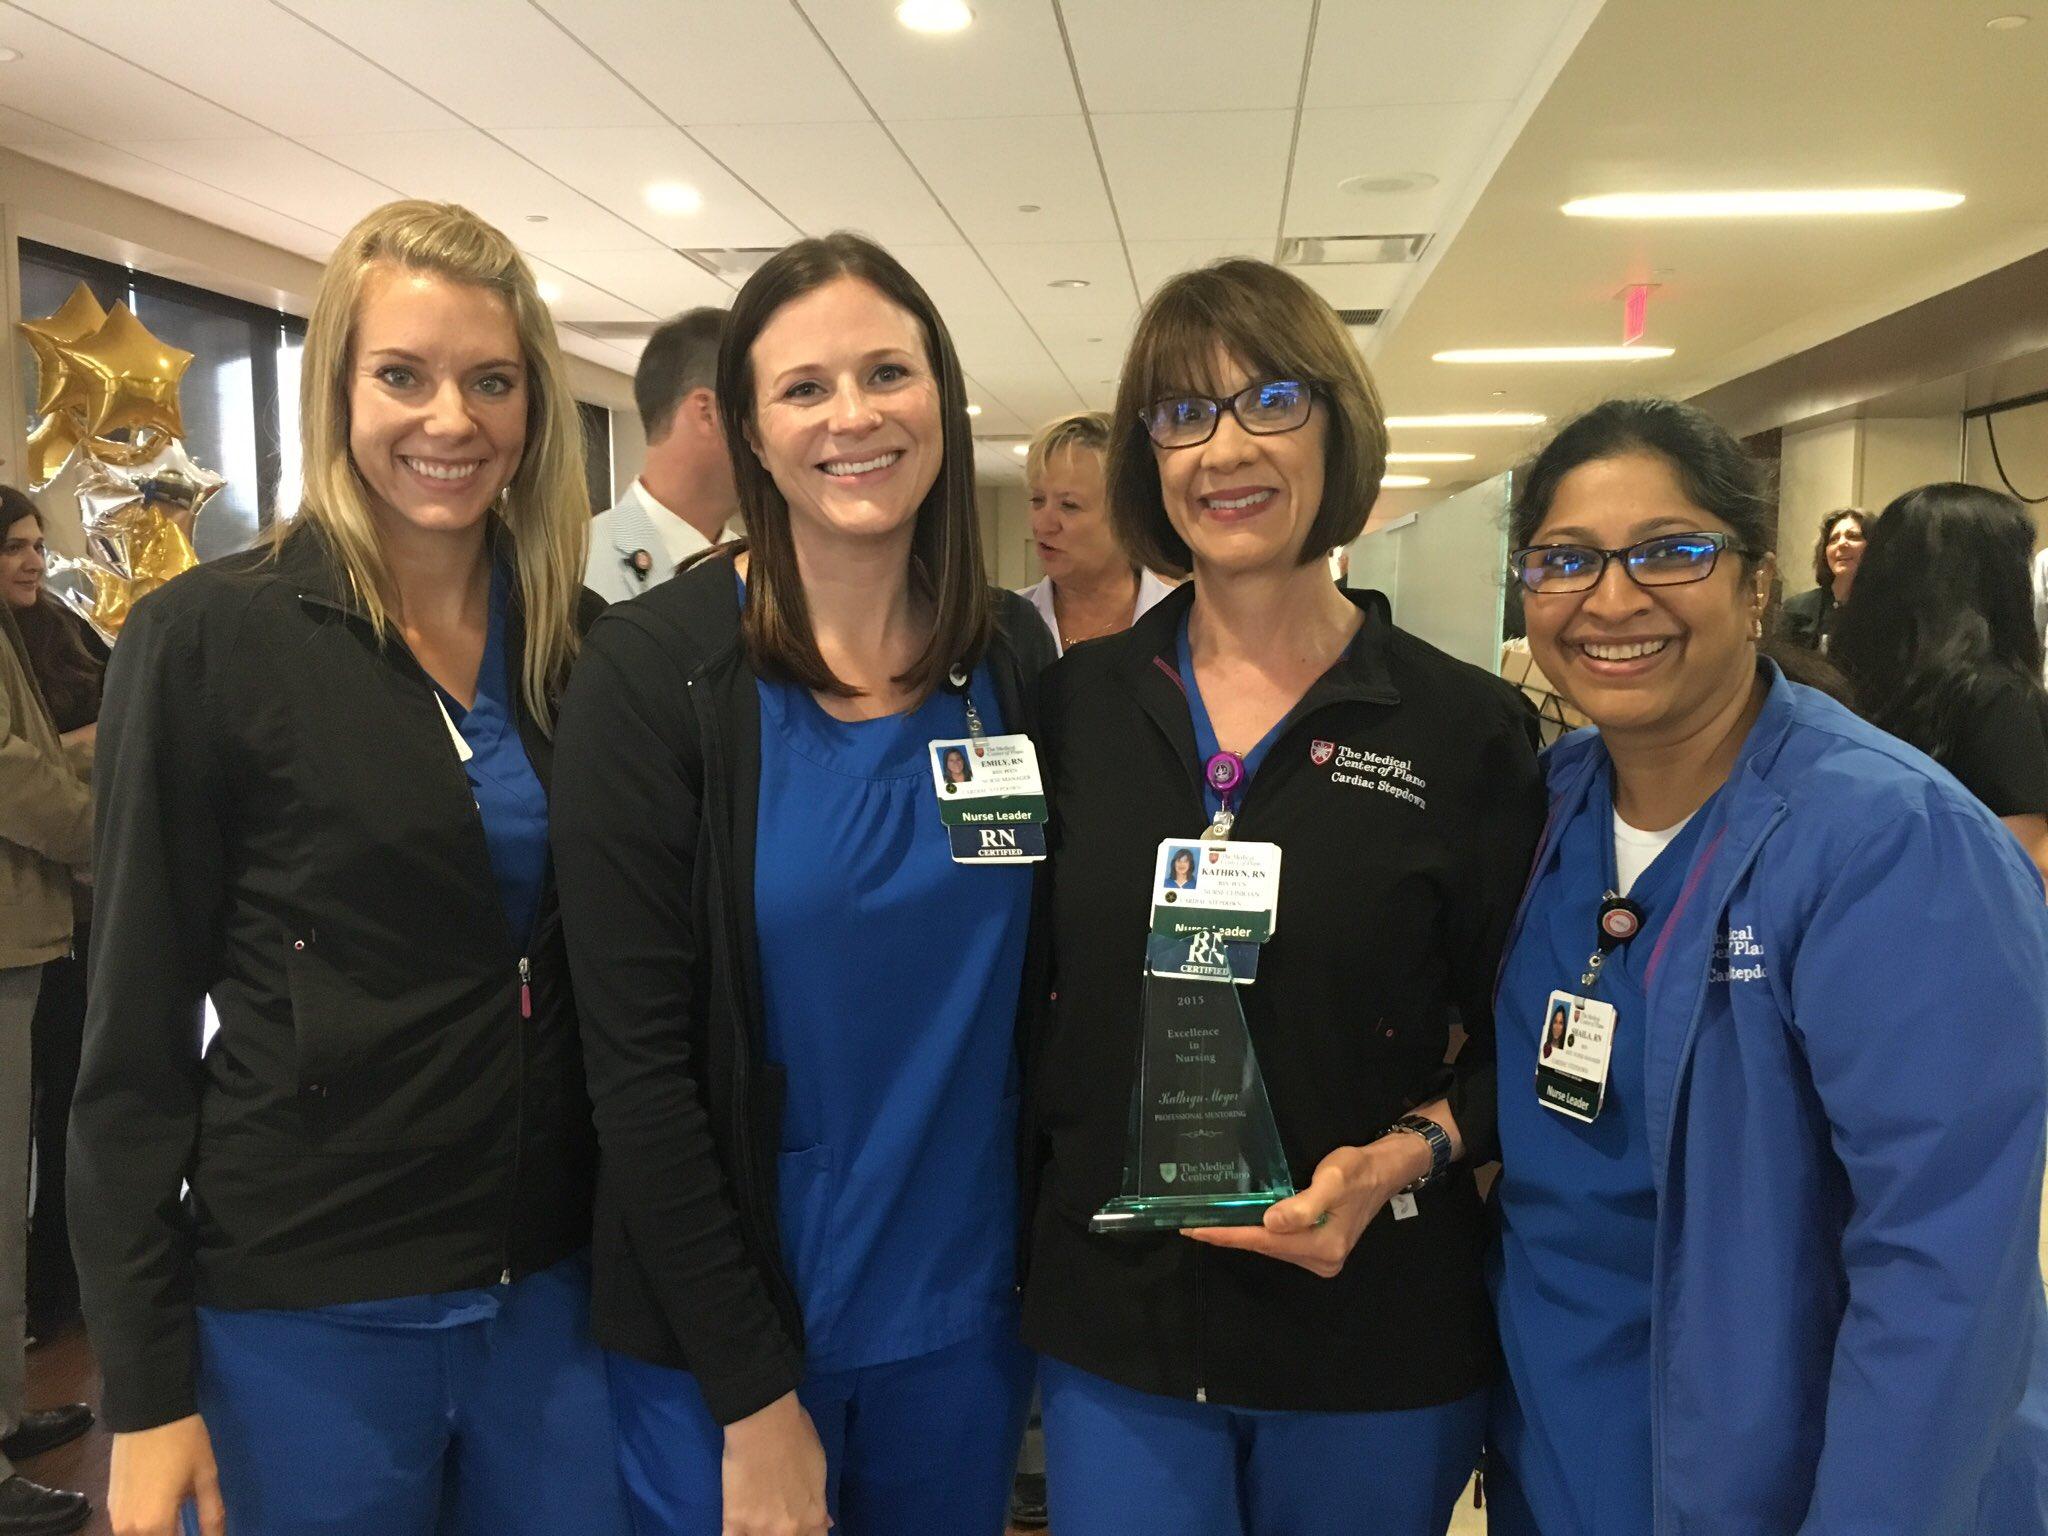 HCA medical staff received award